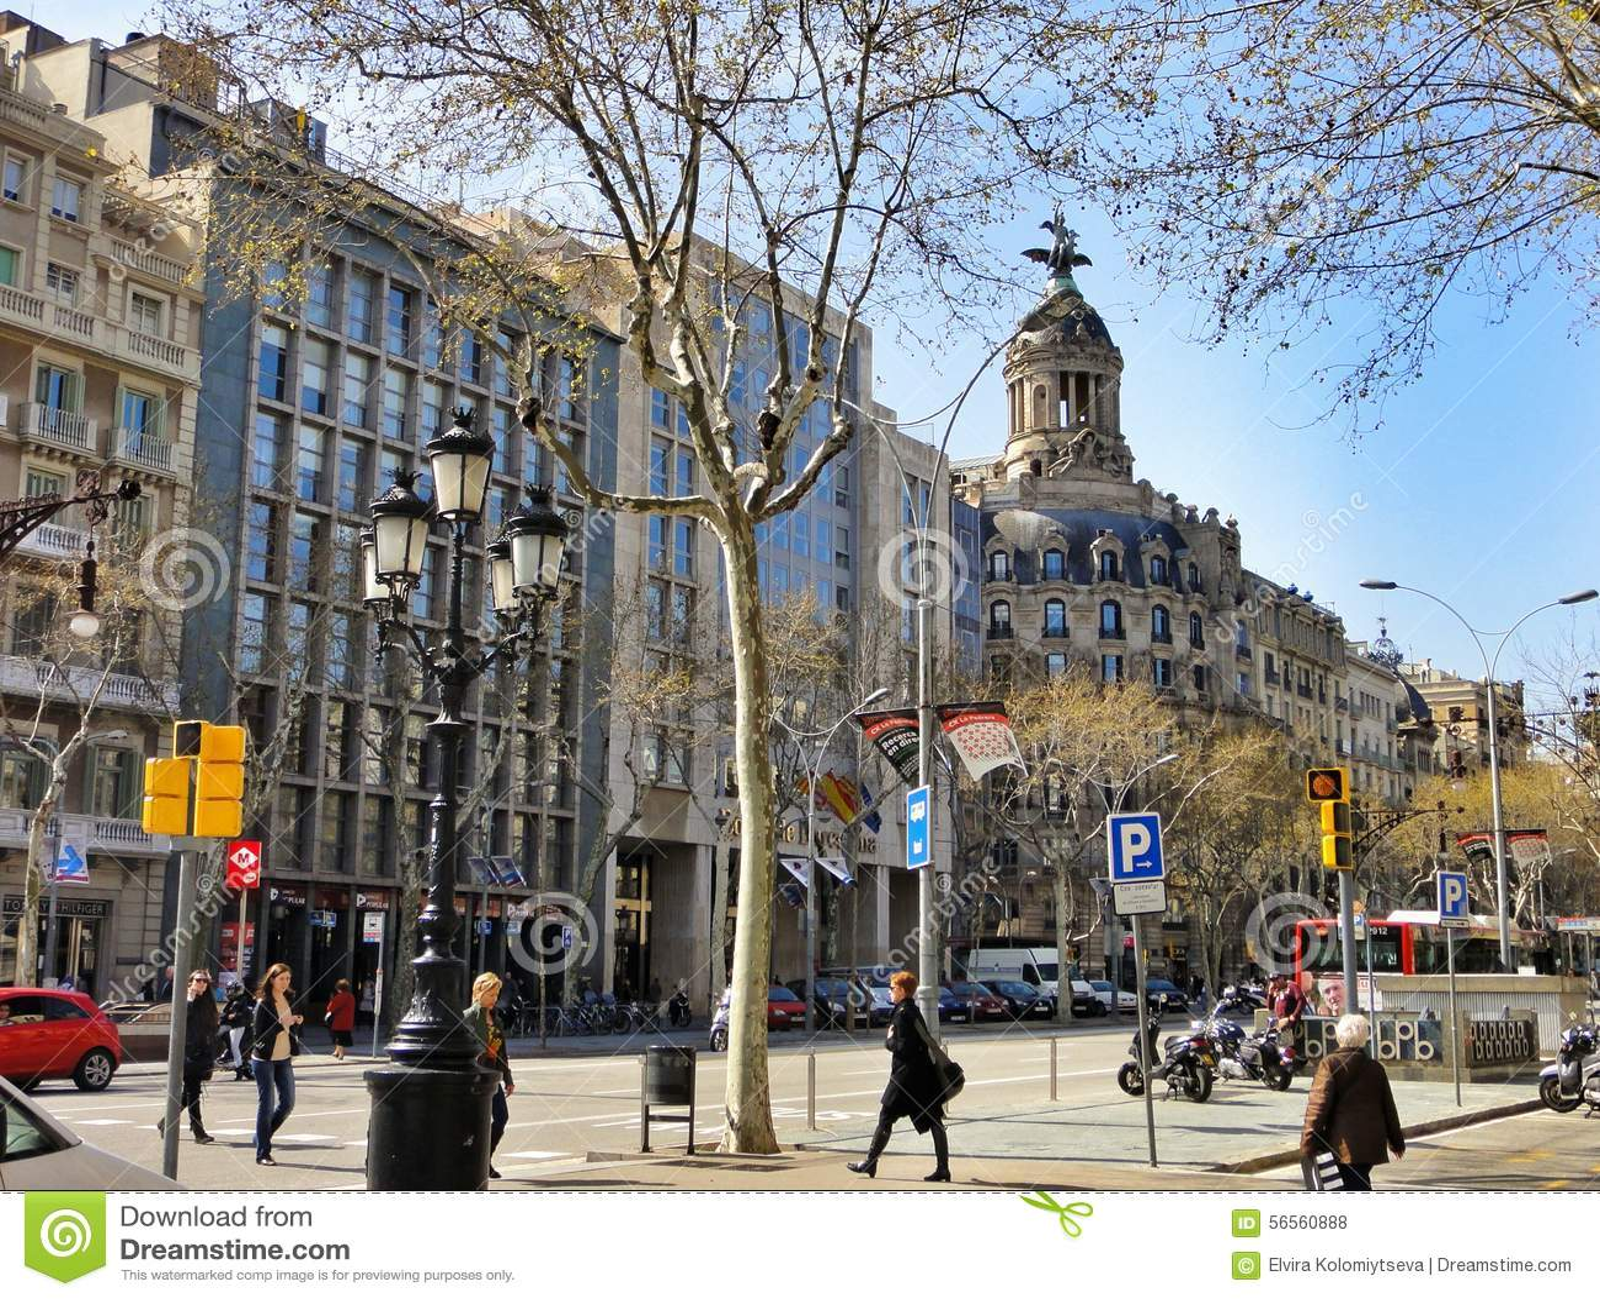 Download Παραδοσιακή αρχιτεκτονική της Βαρκελώνης, Ισπανία Εκδοτική Στοκ Εικόνες - εικόνα από μεσογειακός, μπαλκονιών: 56560888